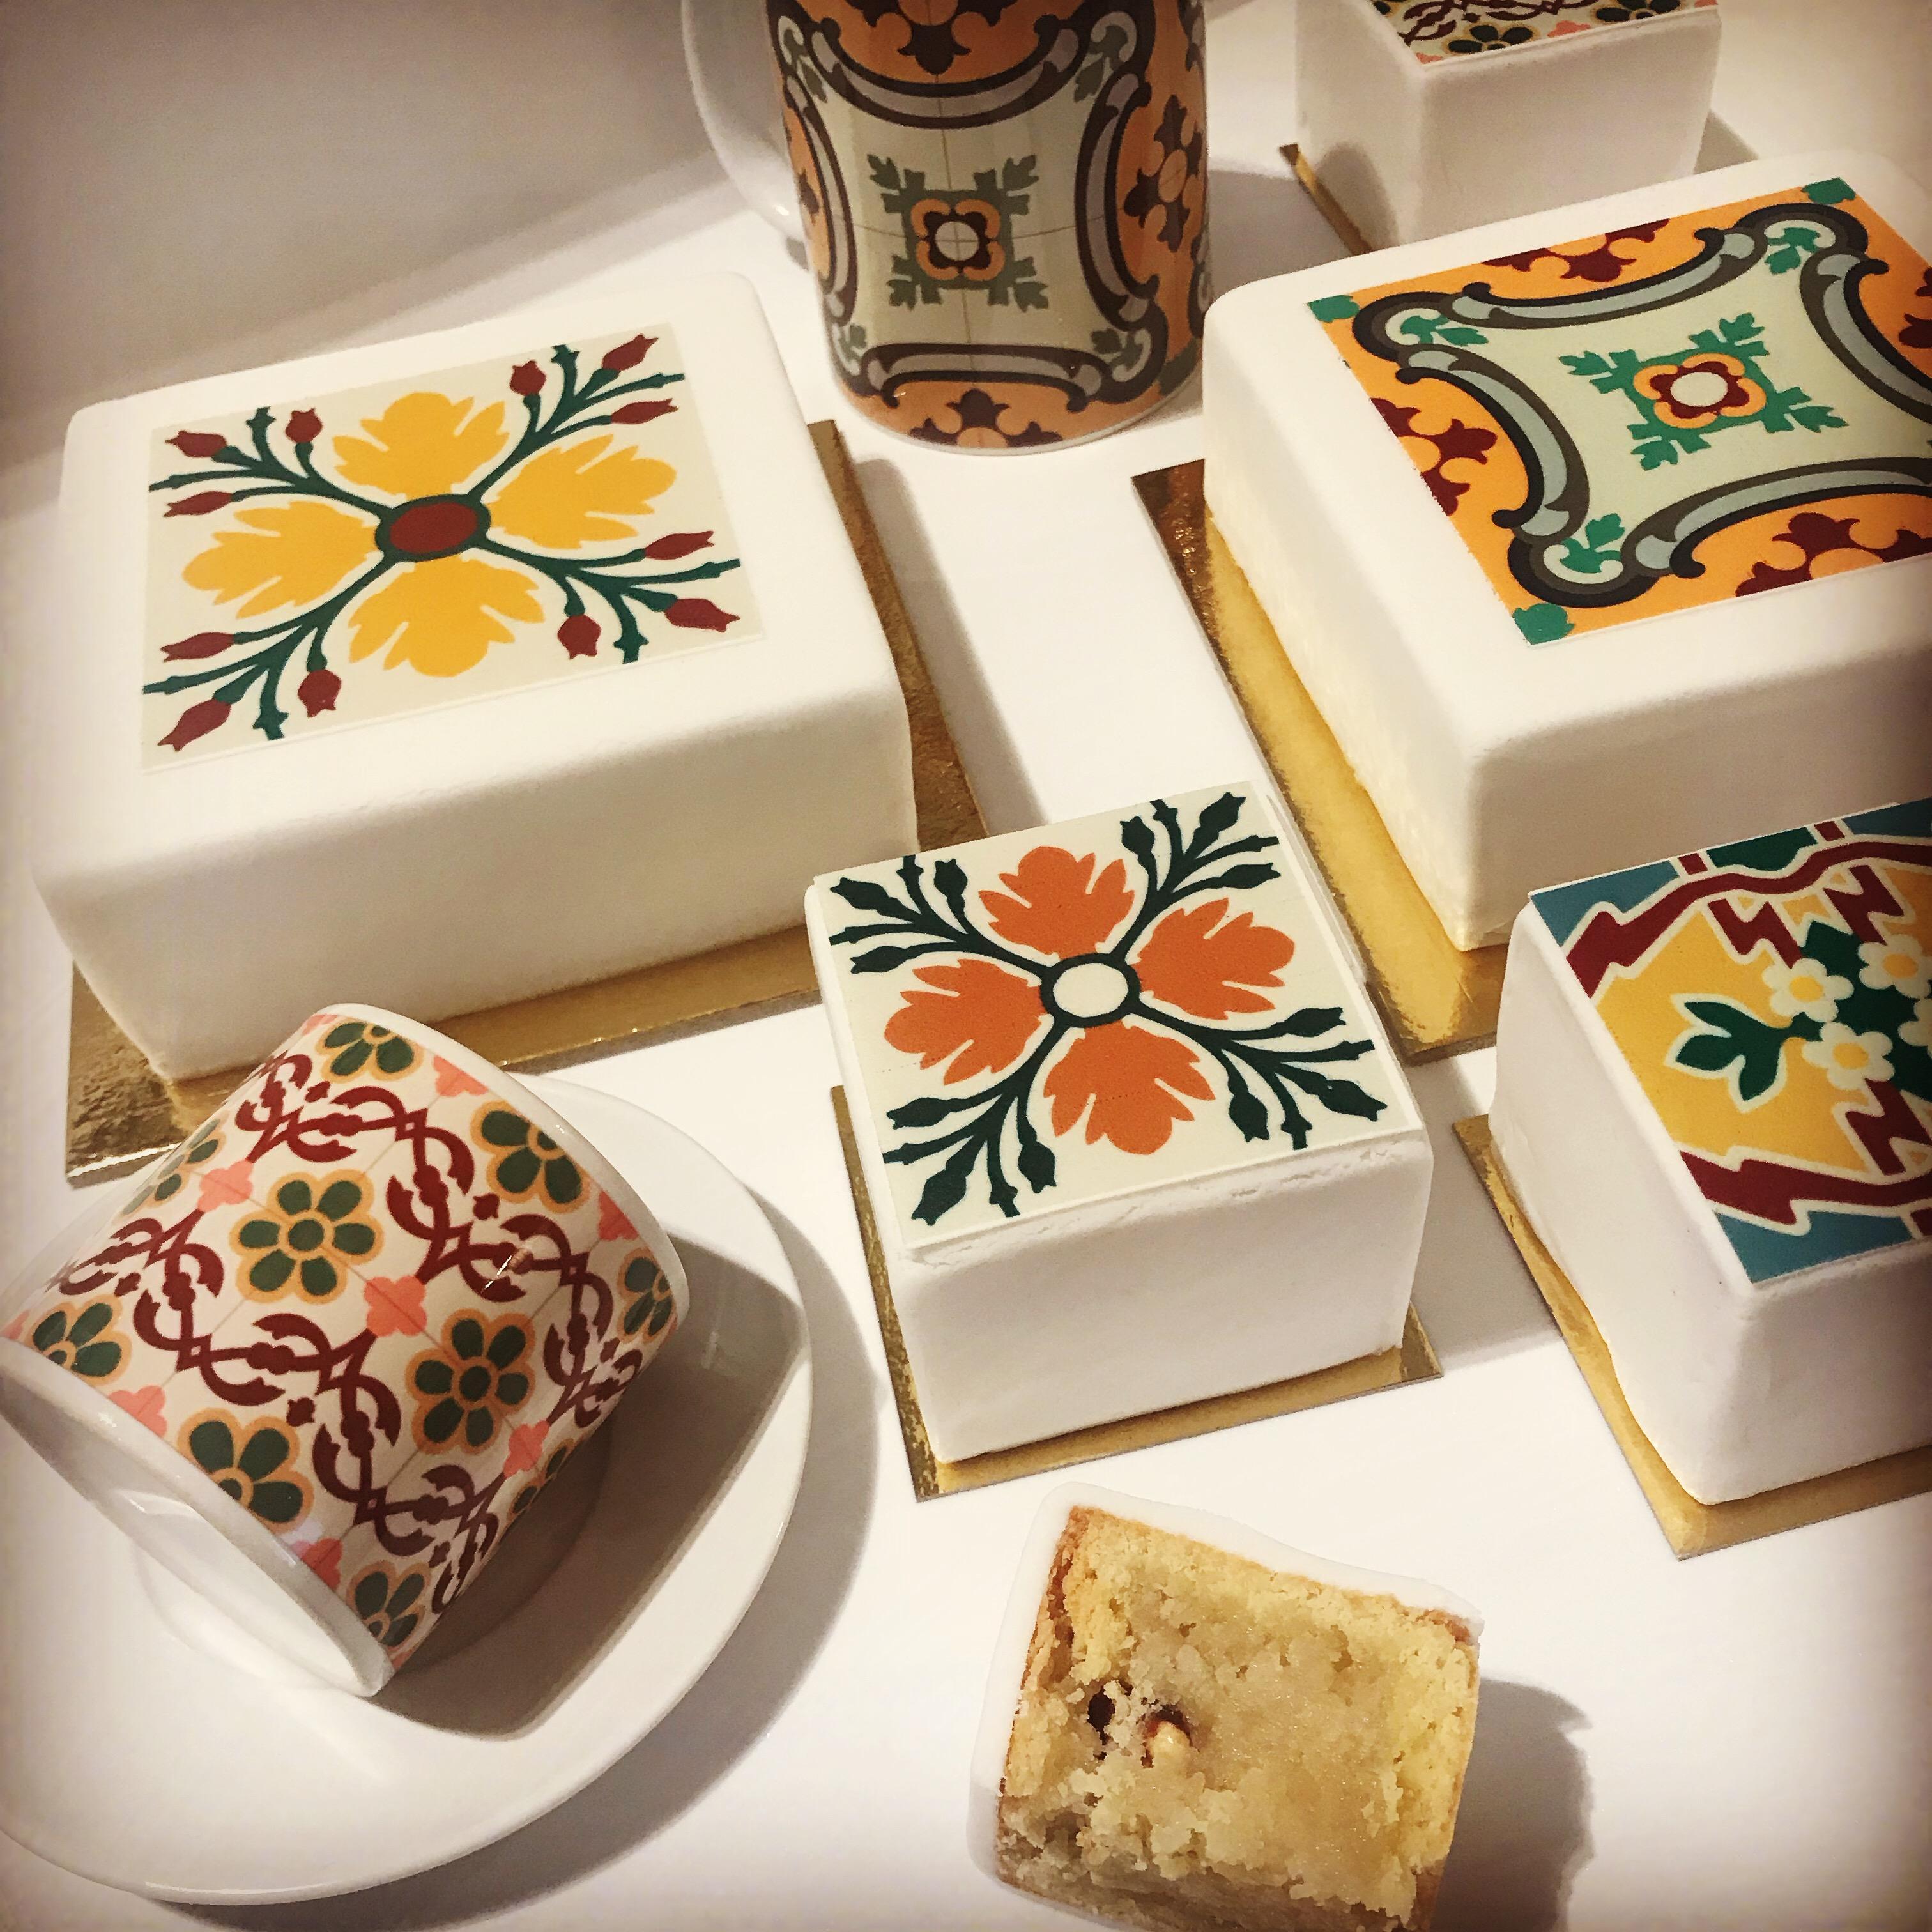 Tile Pattern Artisan Figolli are back!